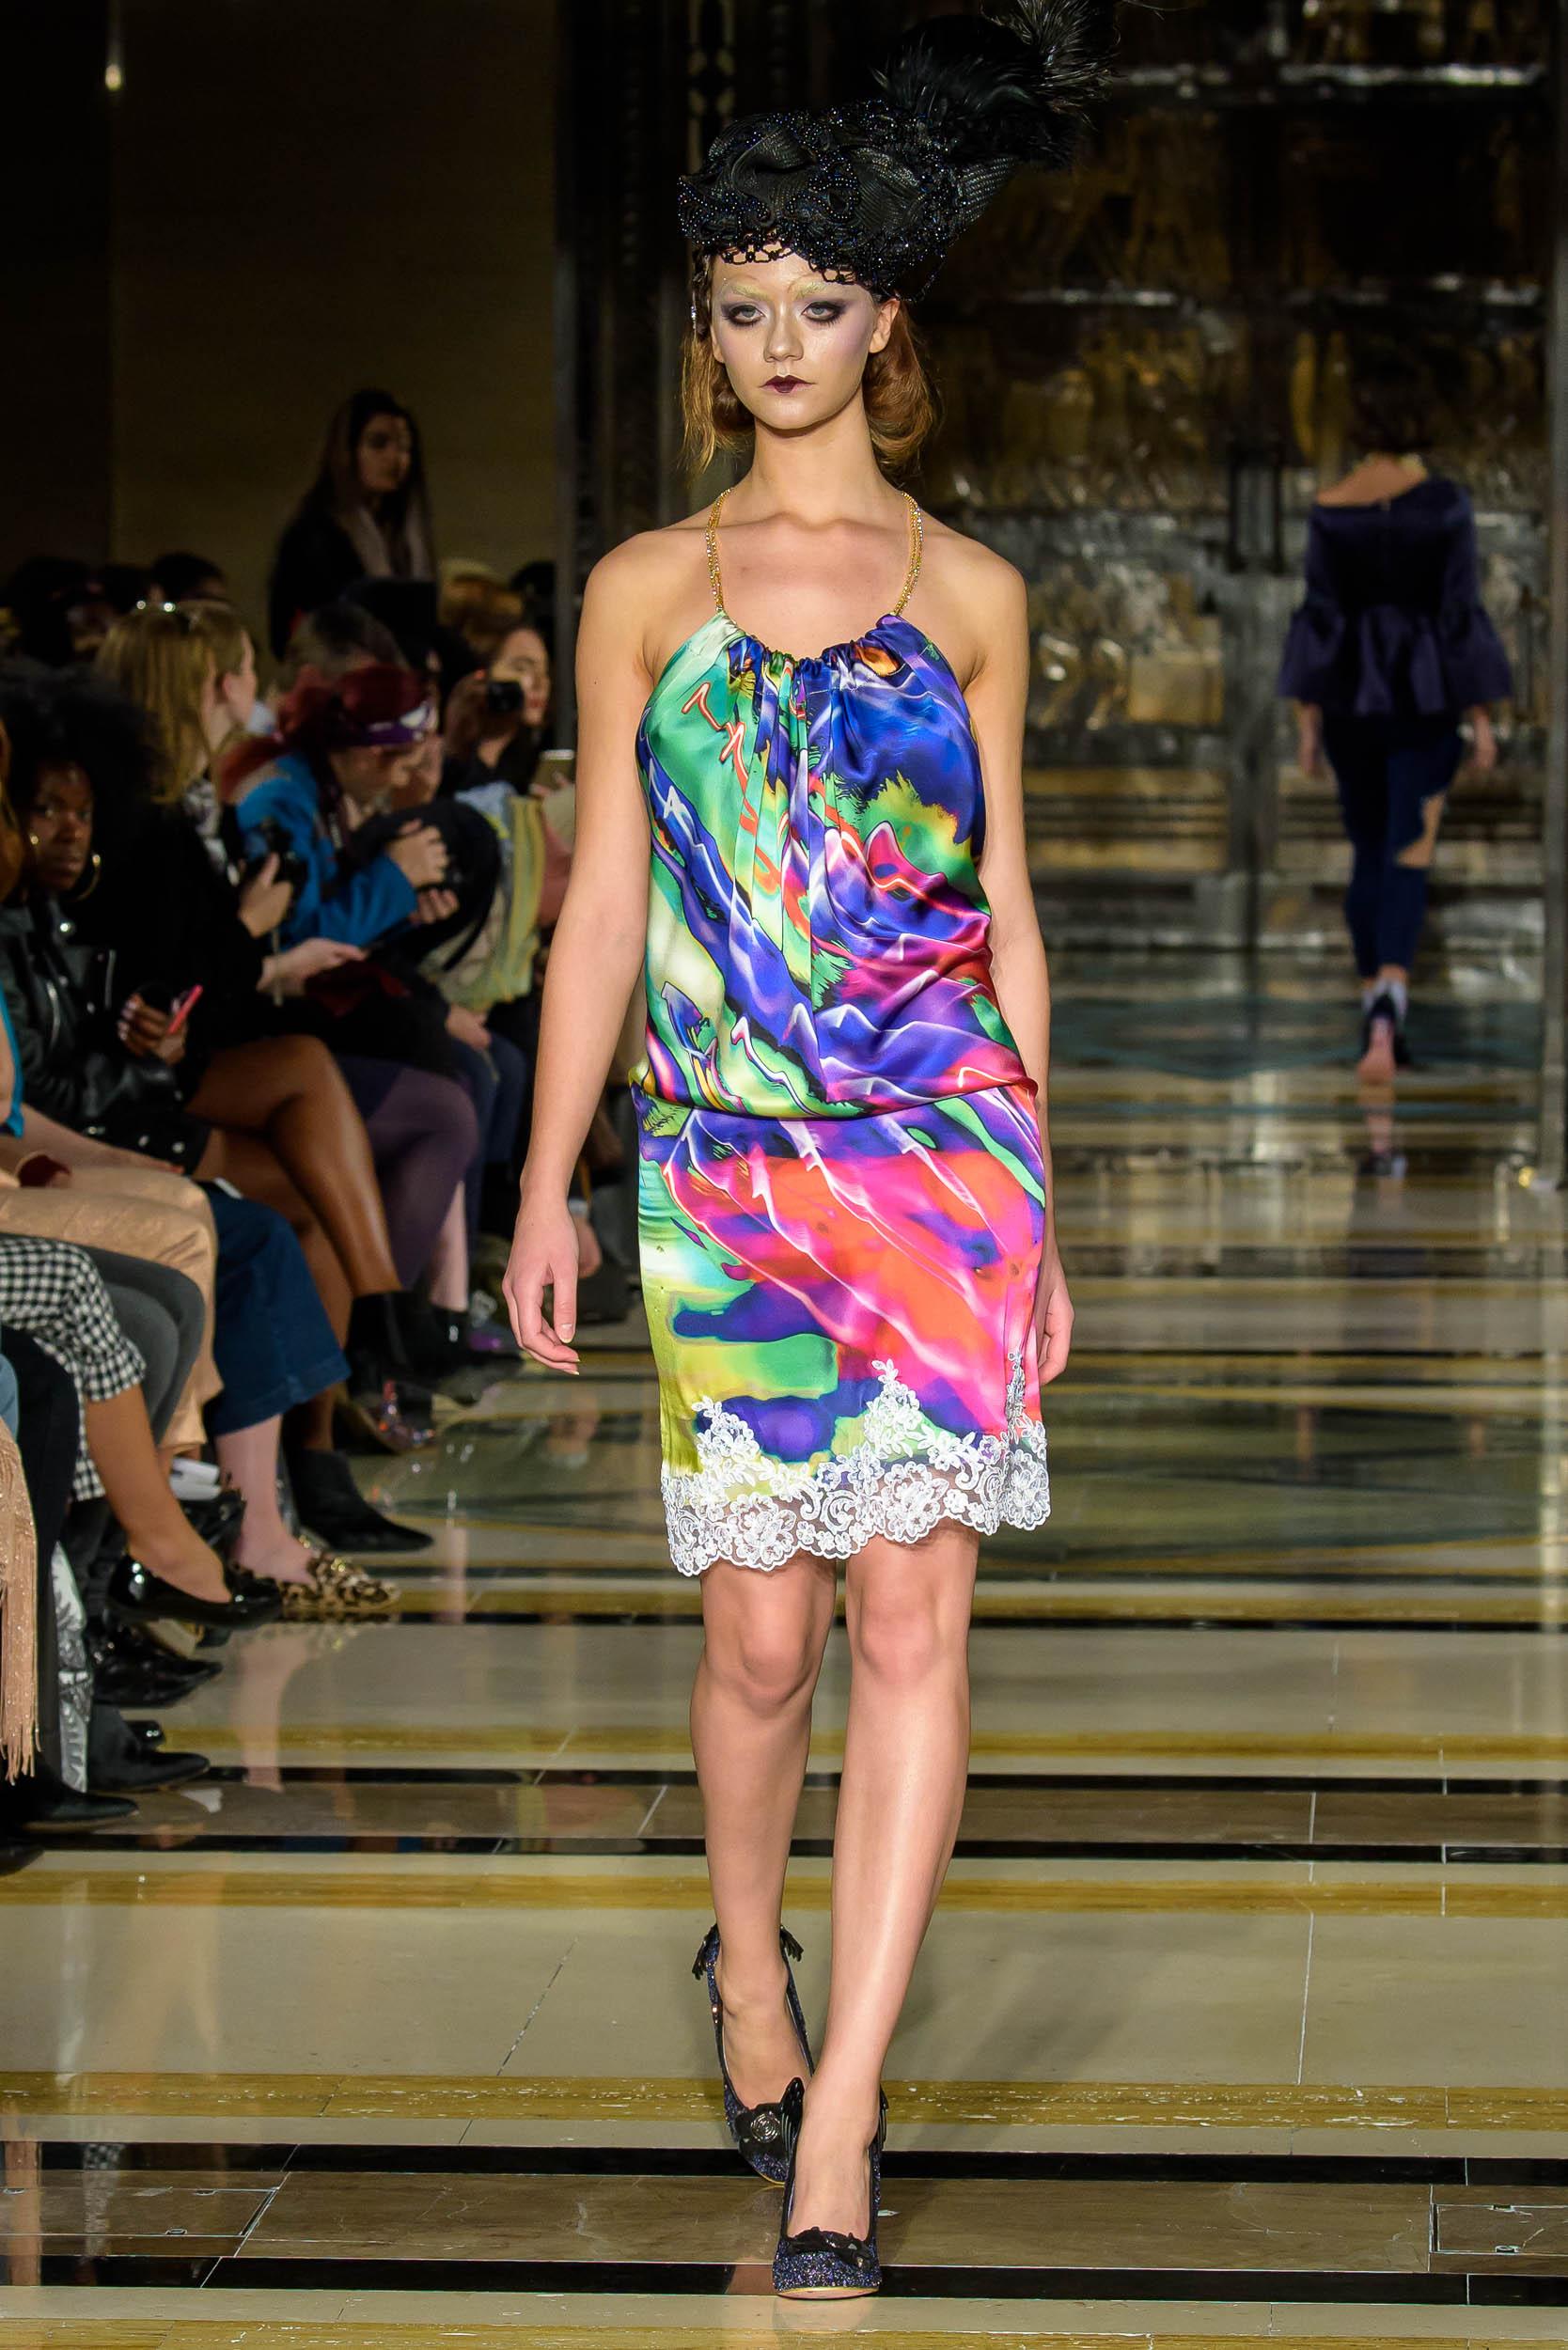 London Fashion Week S/S18 catwalk fashion show by Michaela Frankova photographer Barry Green